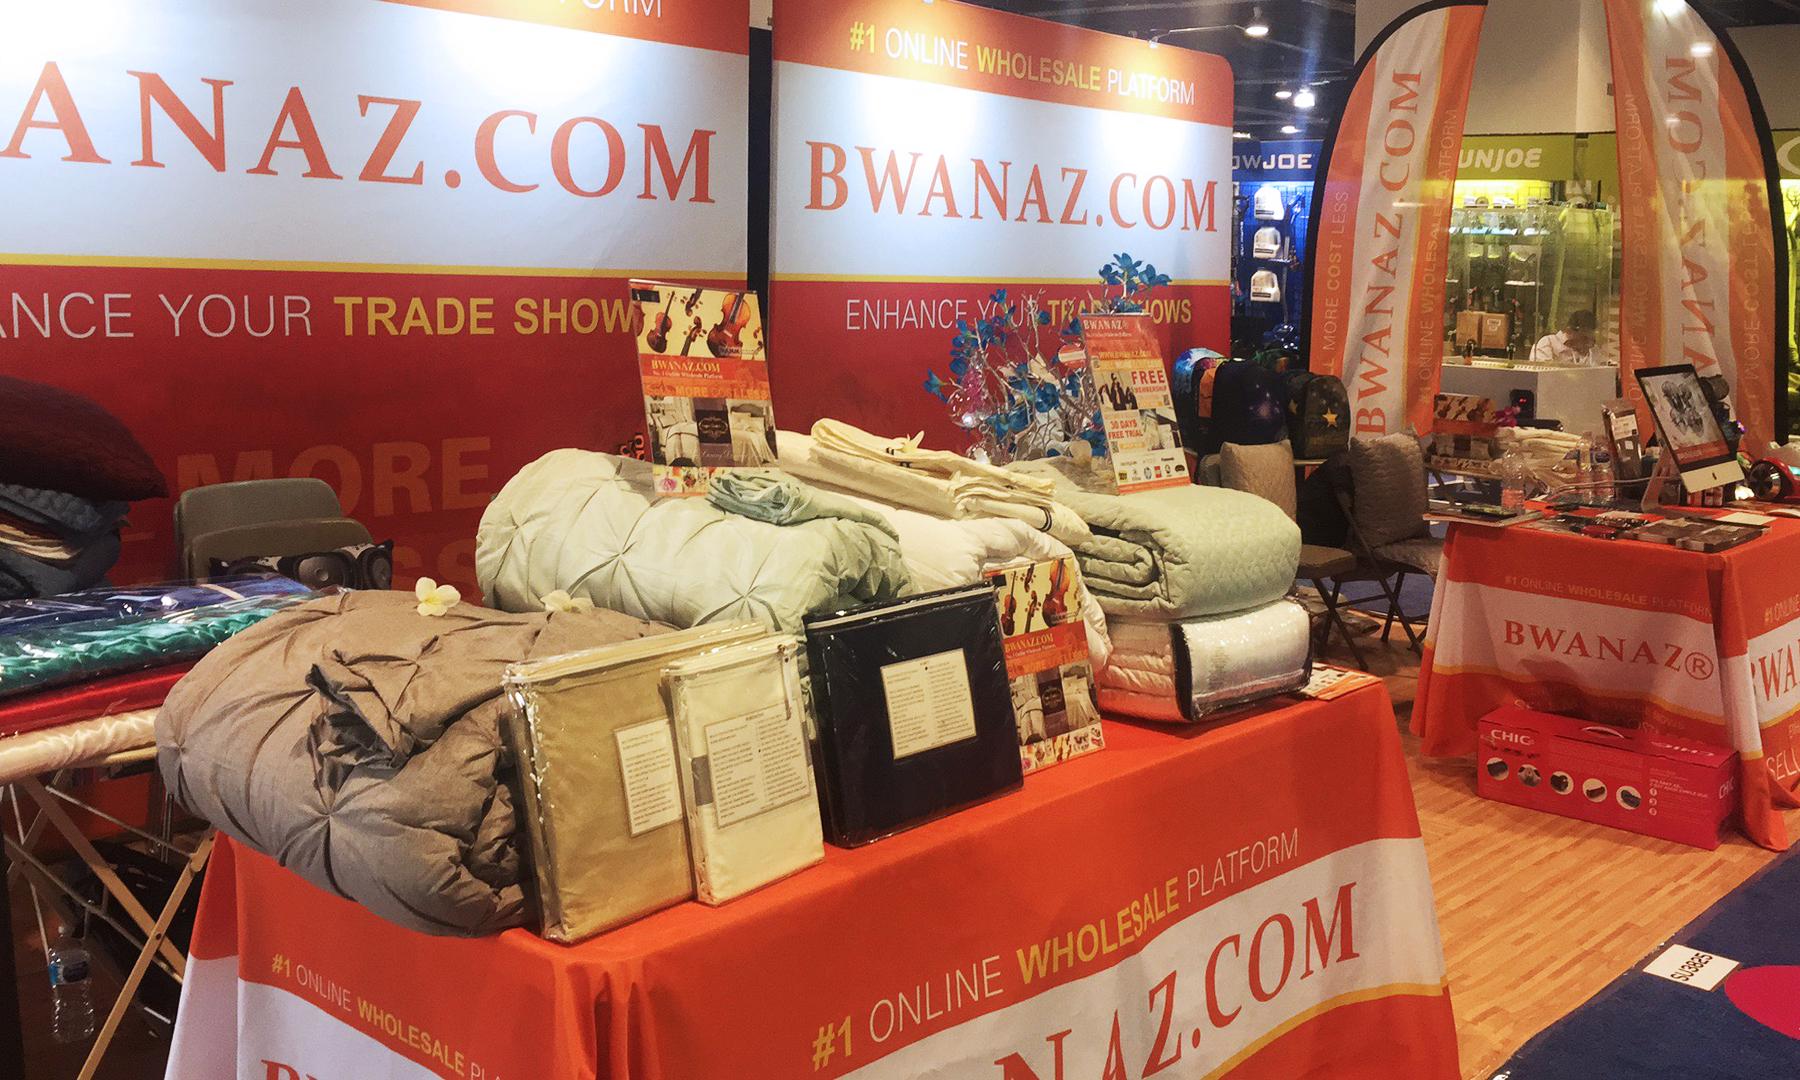 A New Online Wholesale Marketplace That Inspires 2018 ASD Market Week In Las Vegas